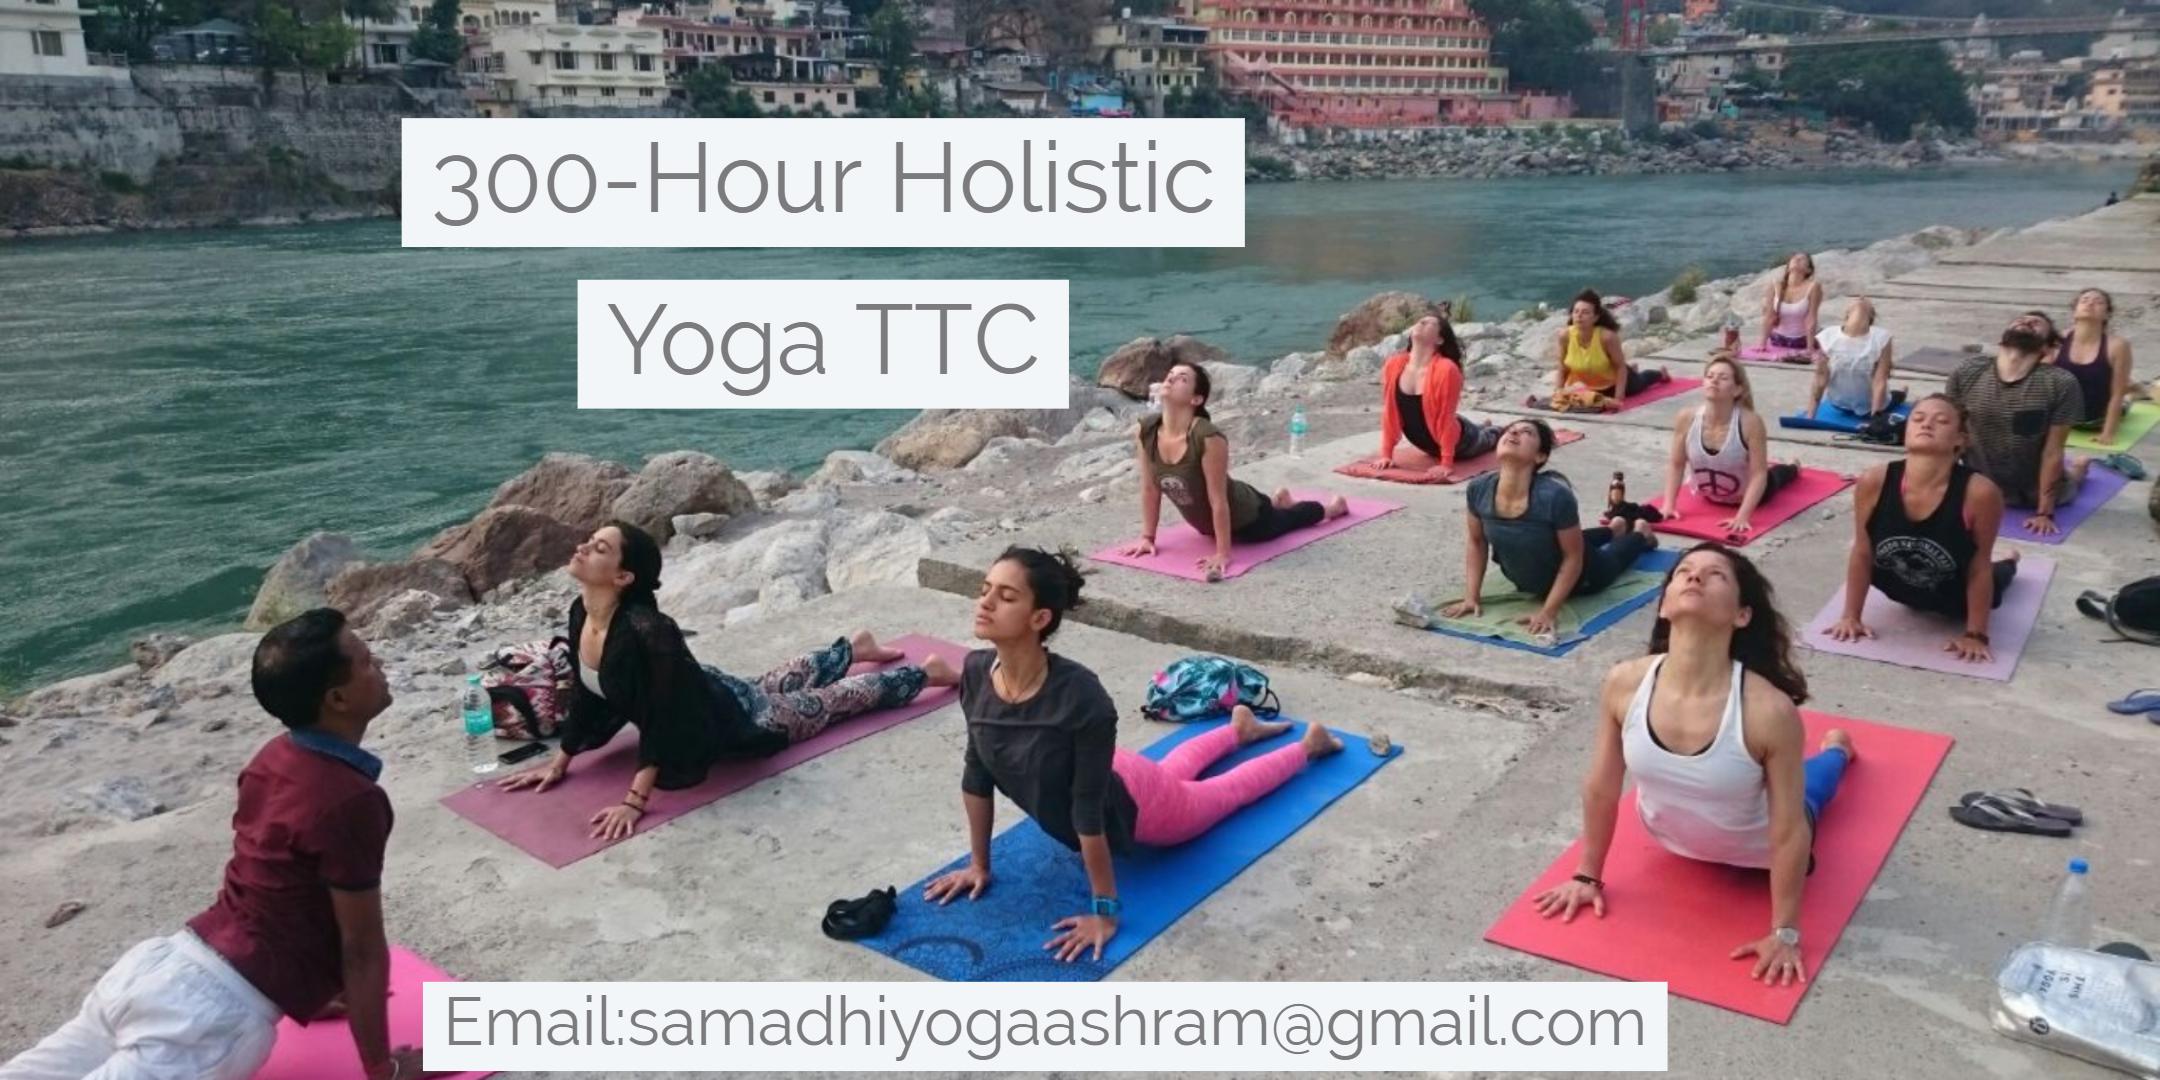 300-Hour Holistic  Yoga Teacher Training in Rishikesh India, Pauri Garhwal, Uttarakhand, India